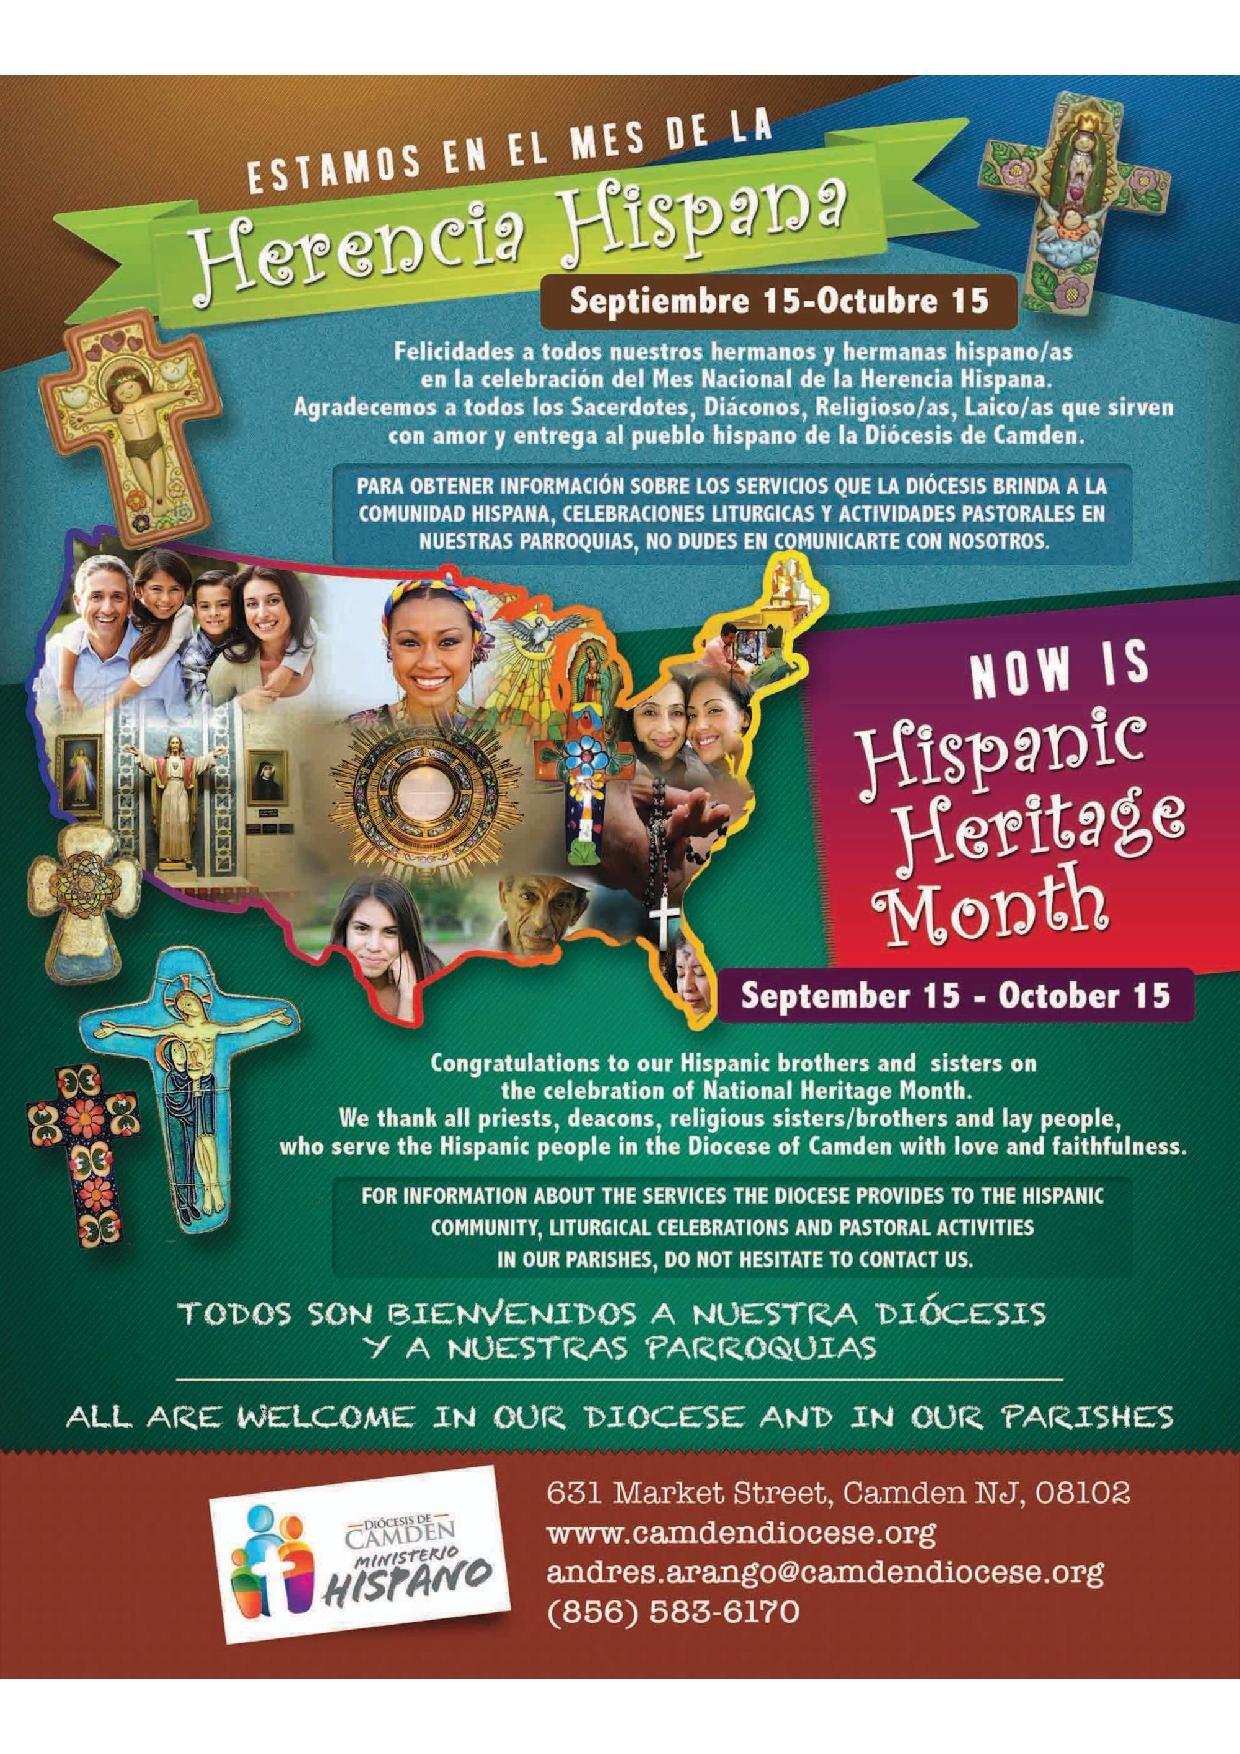 Herencia Hispana Diocese Of Camden